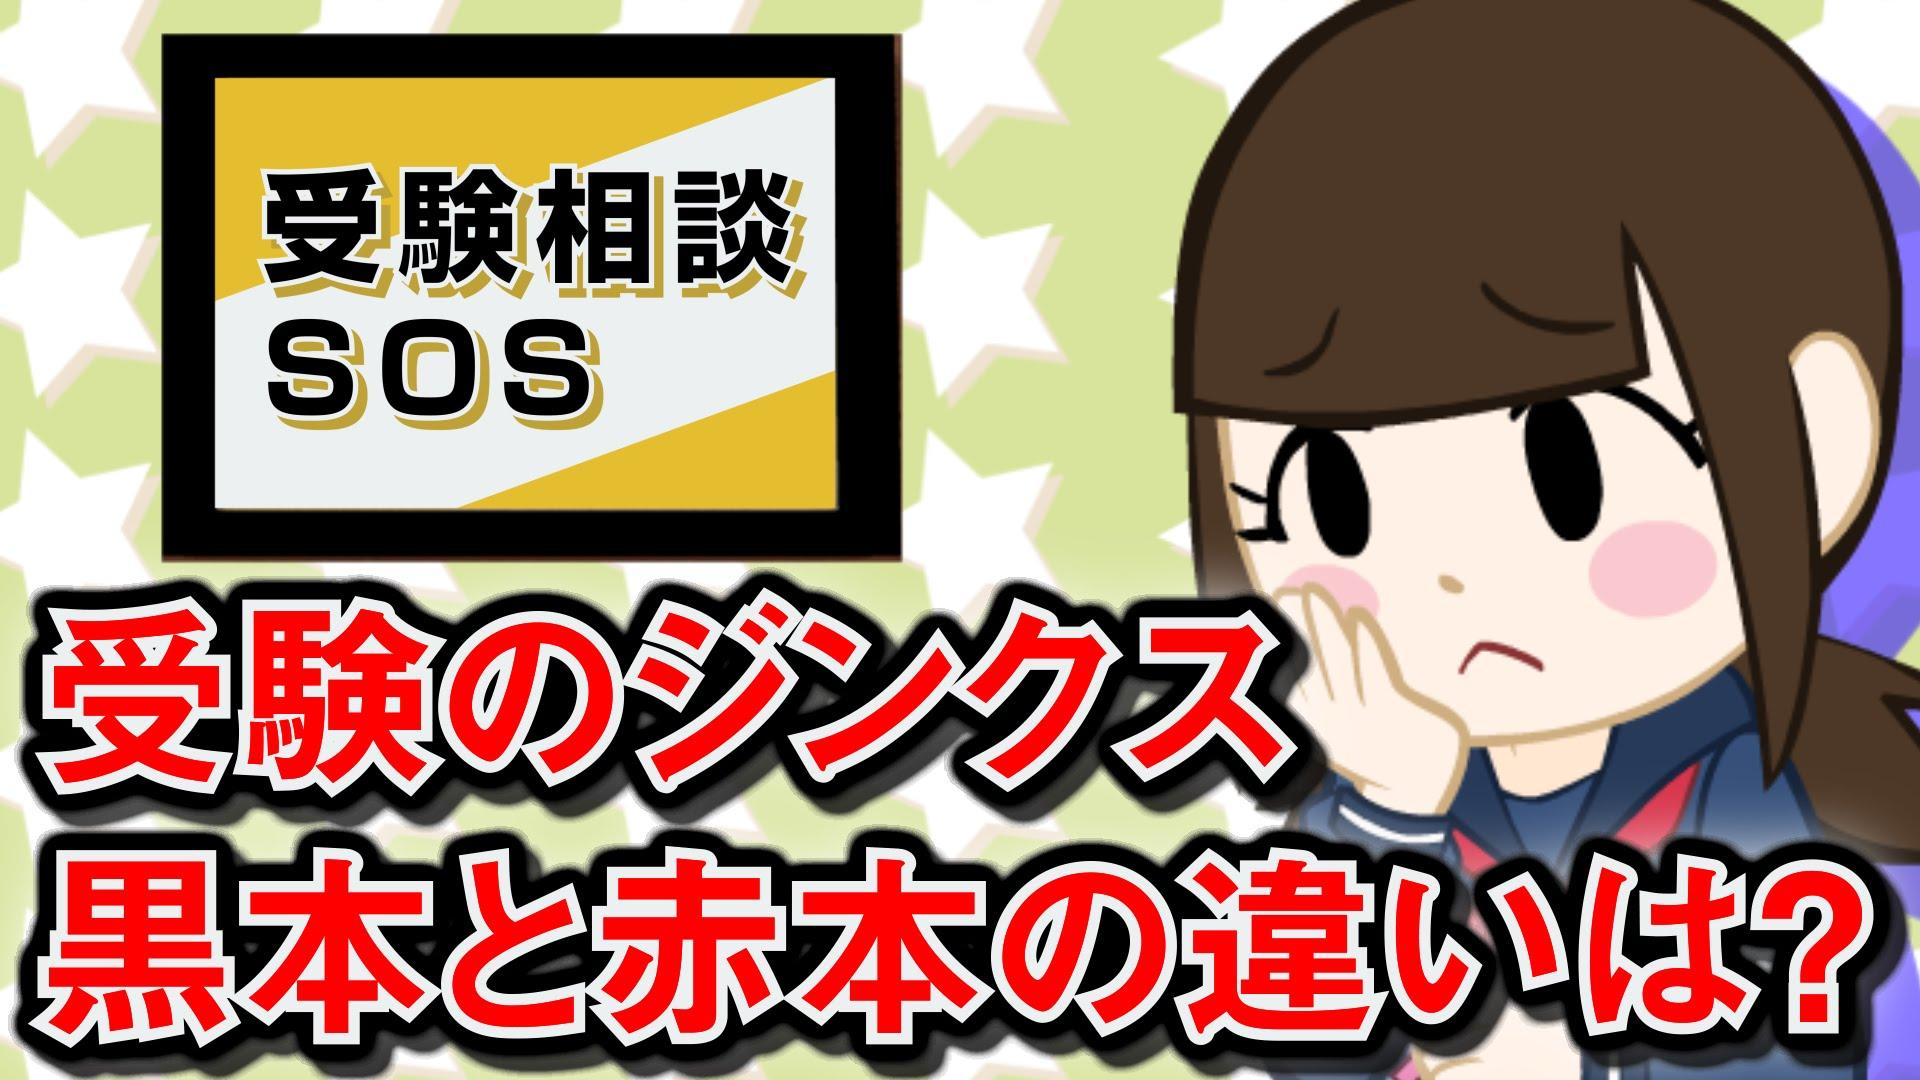 【vol.57】受験のジンクス!?&センター黒本と赤本の違いは!?|受験相談SOS